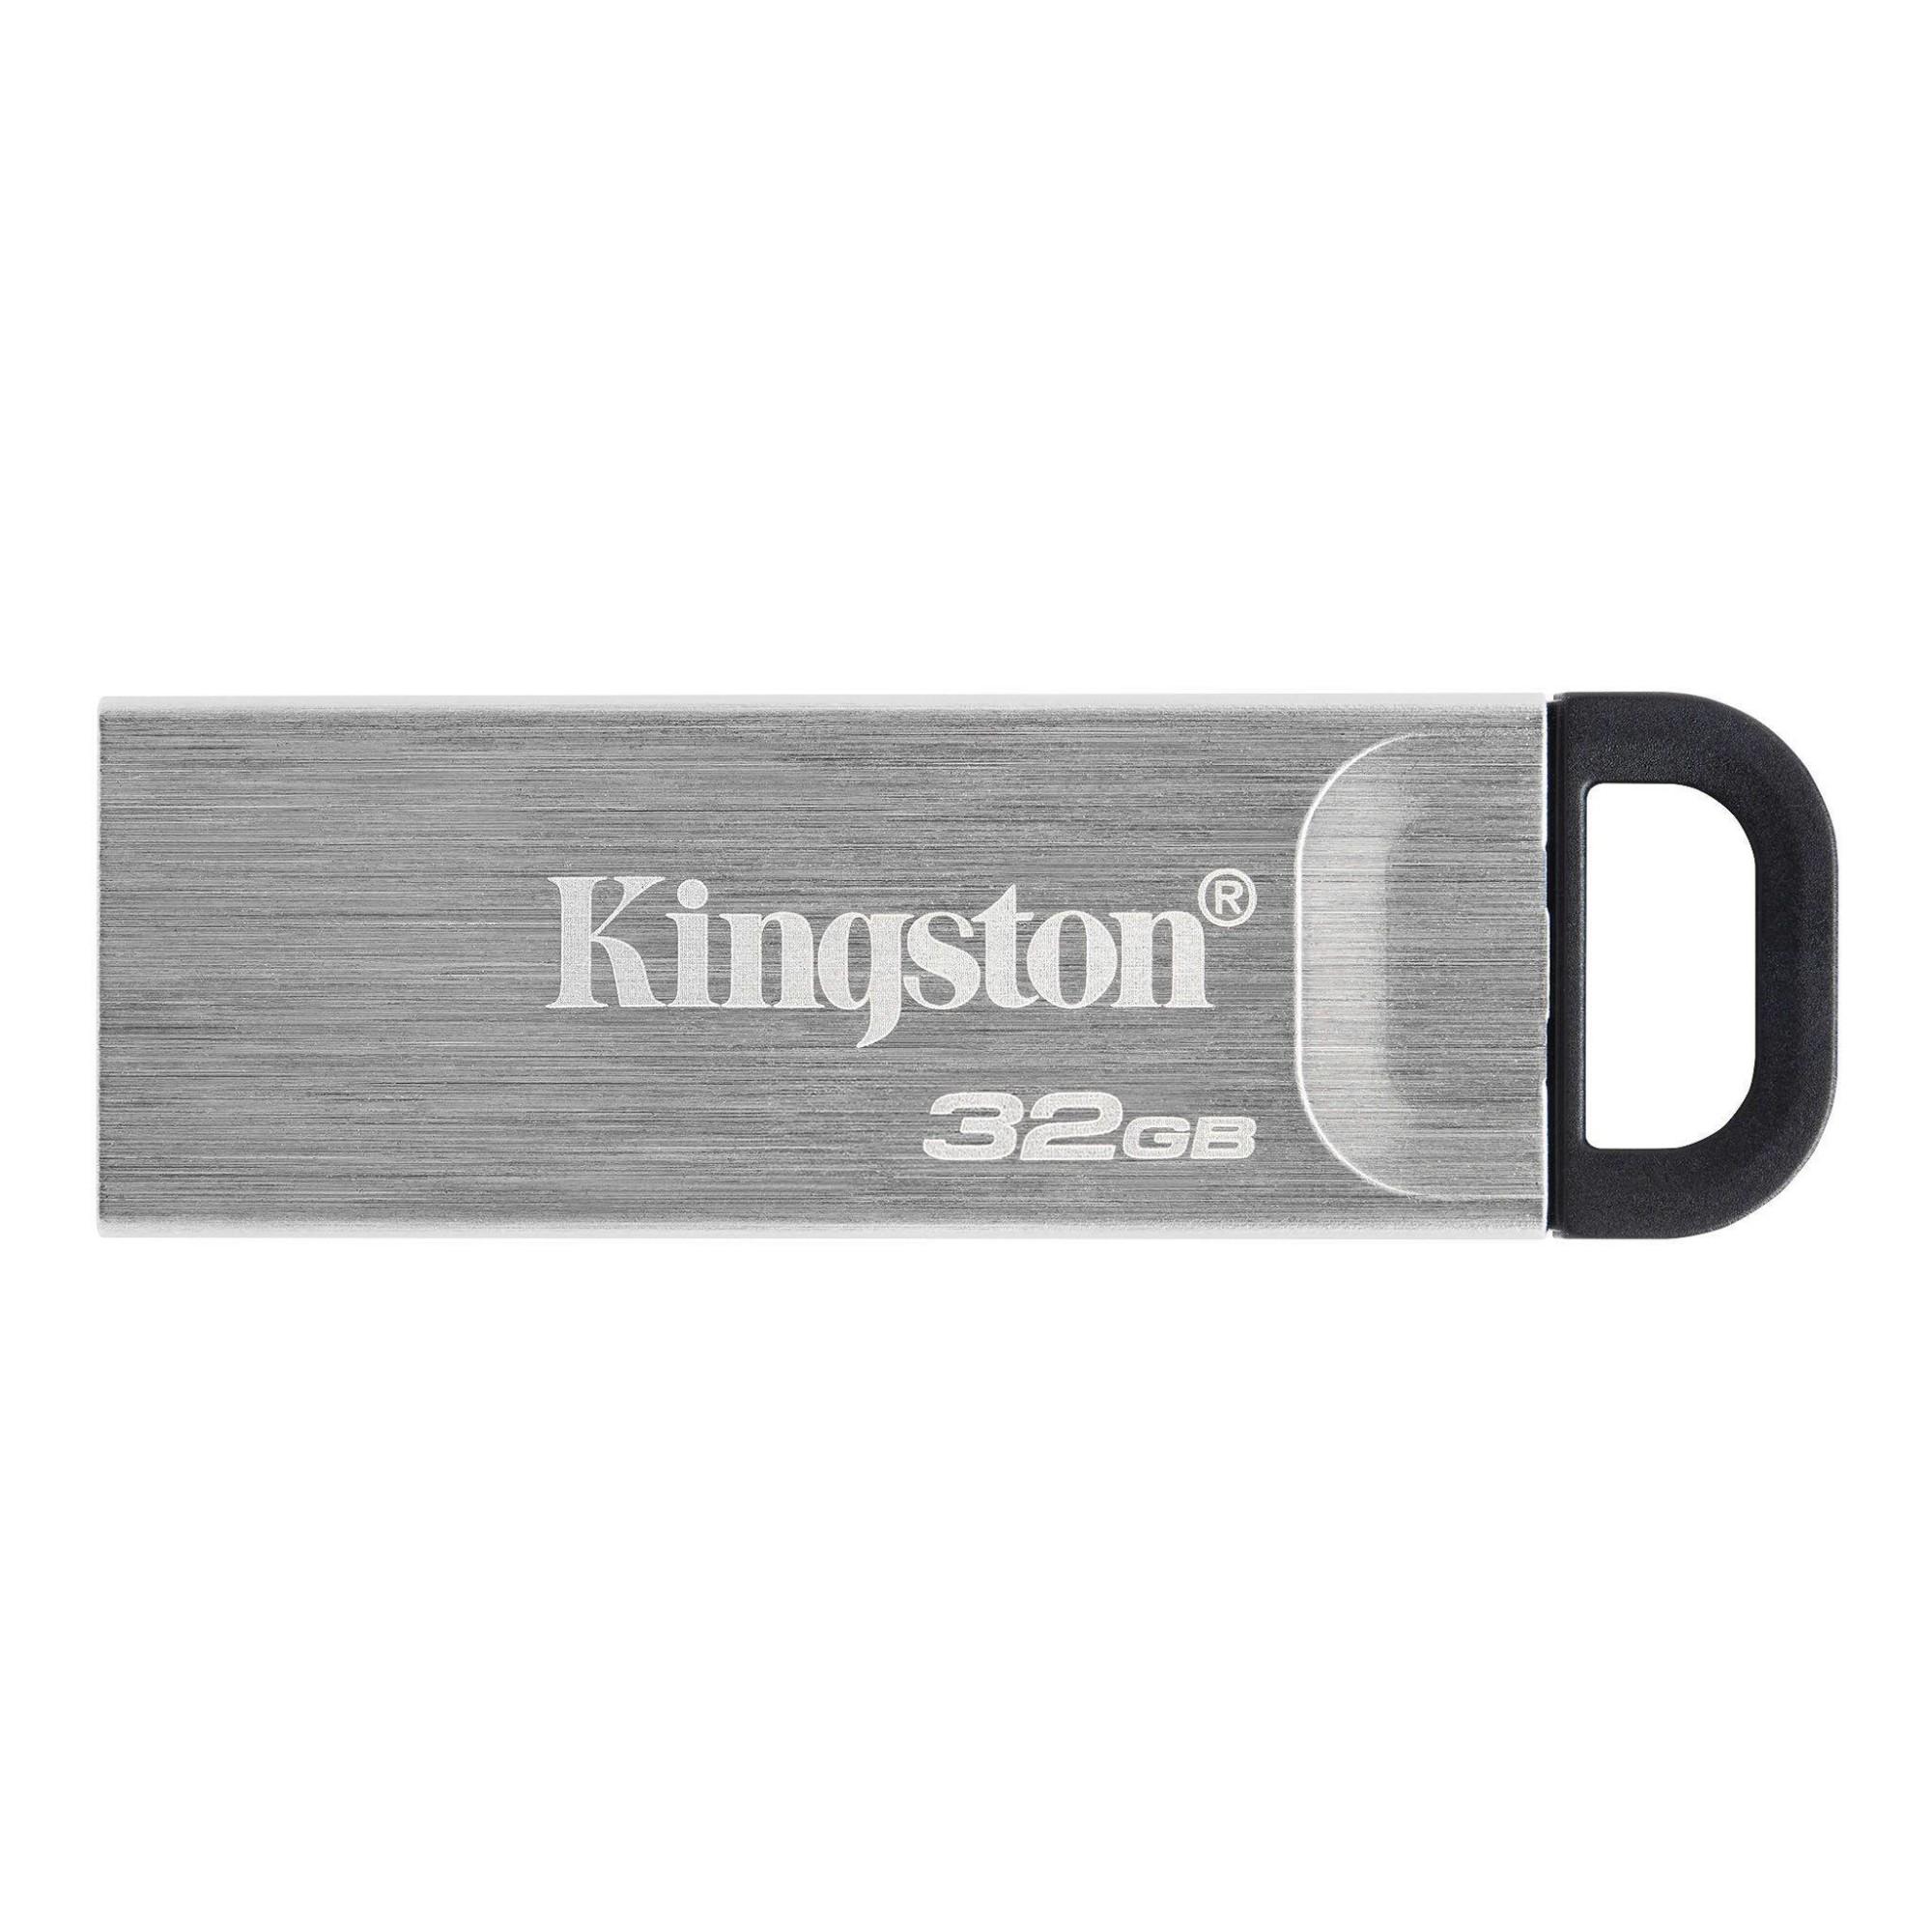 Kingston Technology DataTraveler Kyson USB flash drive 32 GB USB Type-A 3.2 Gen 1 (3.1 Gen 1) Silver